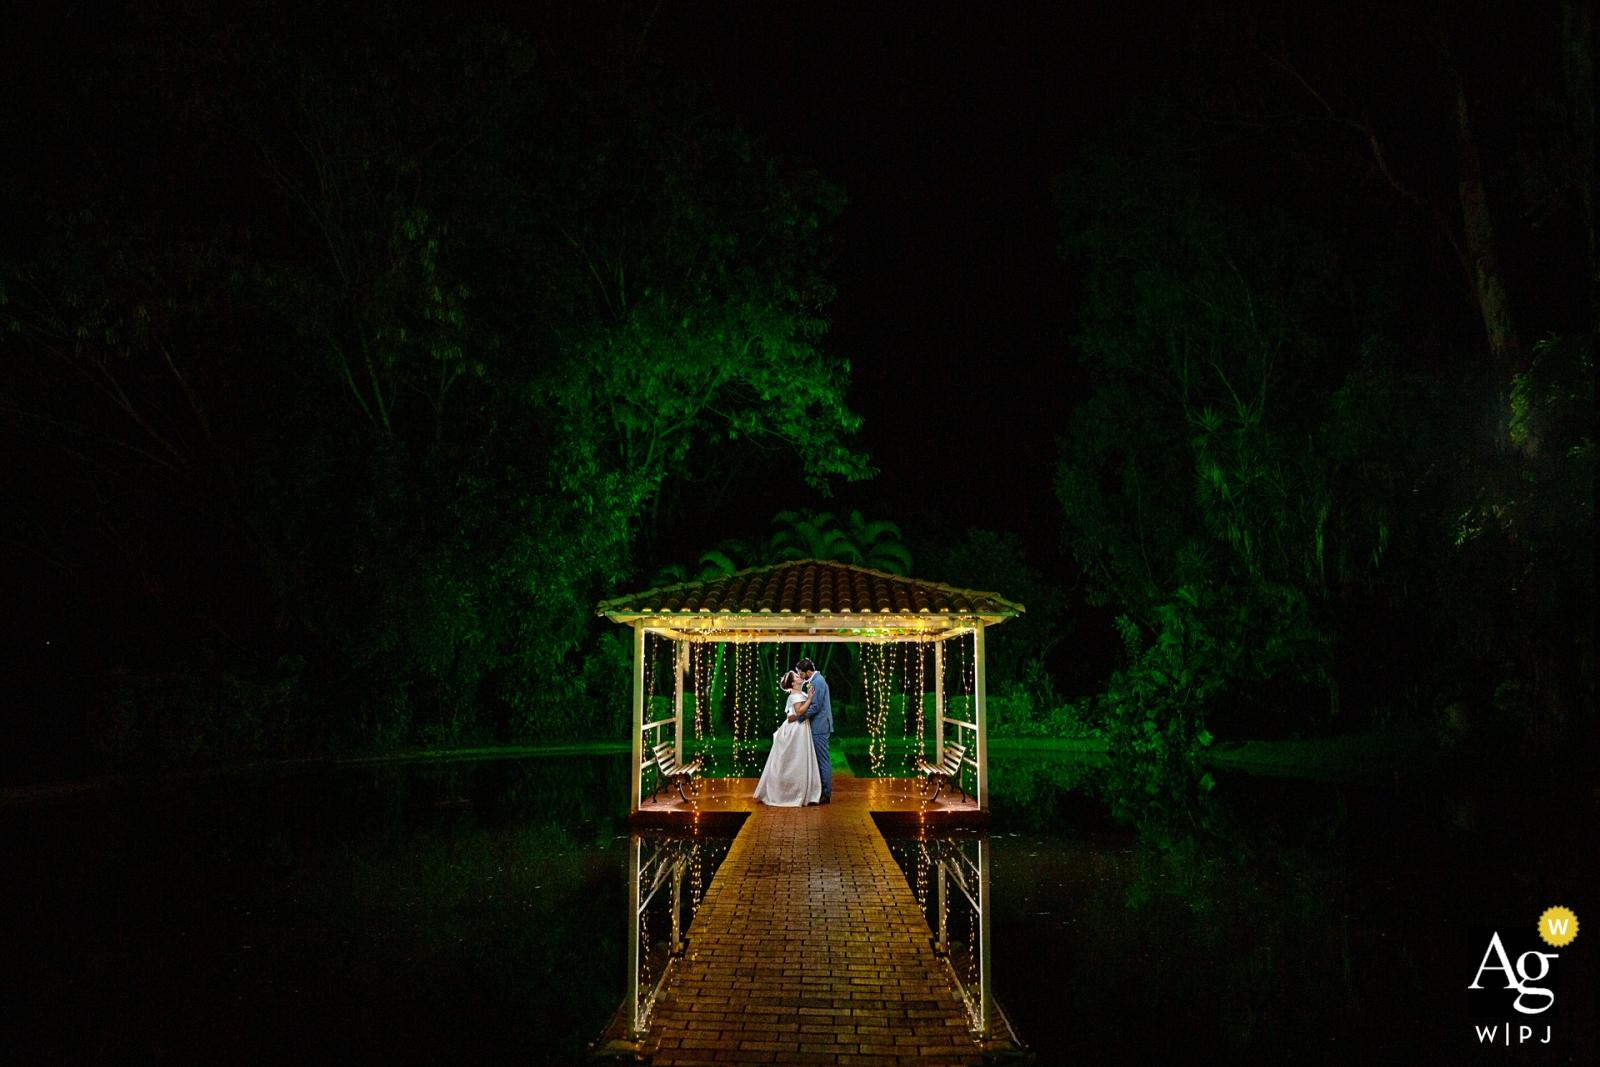 Brazil wedding photographer - Aldeia das Flores portrait at night